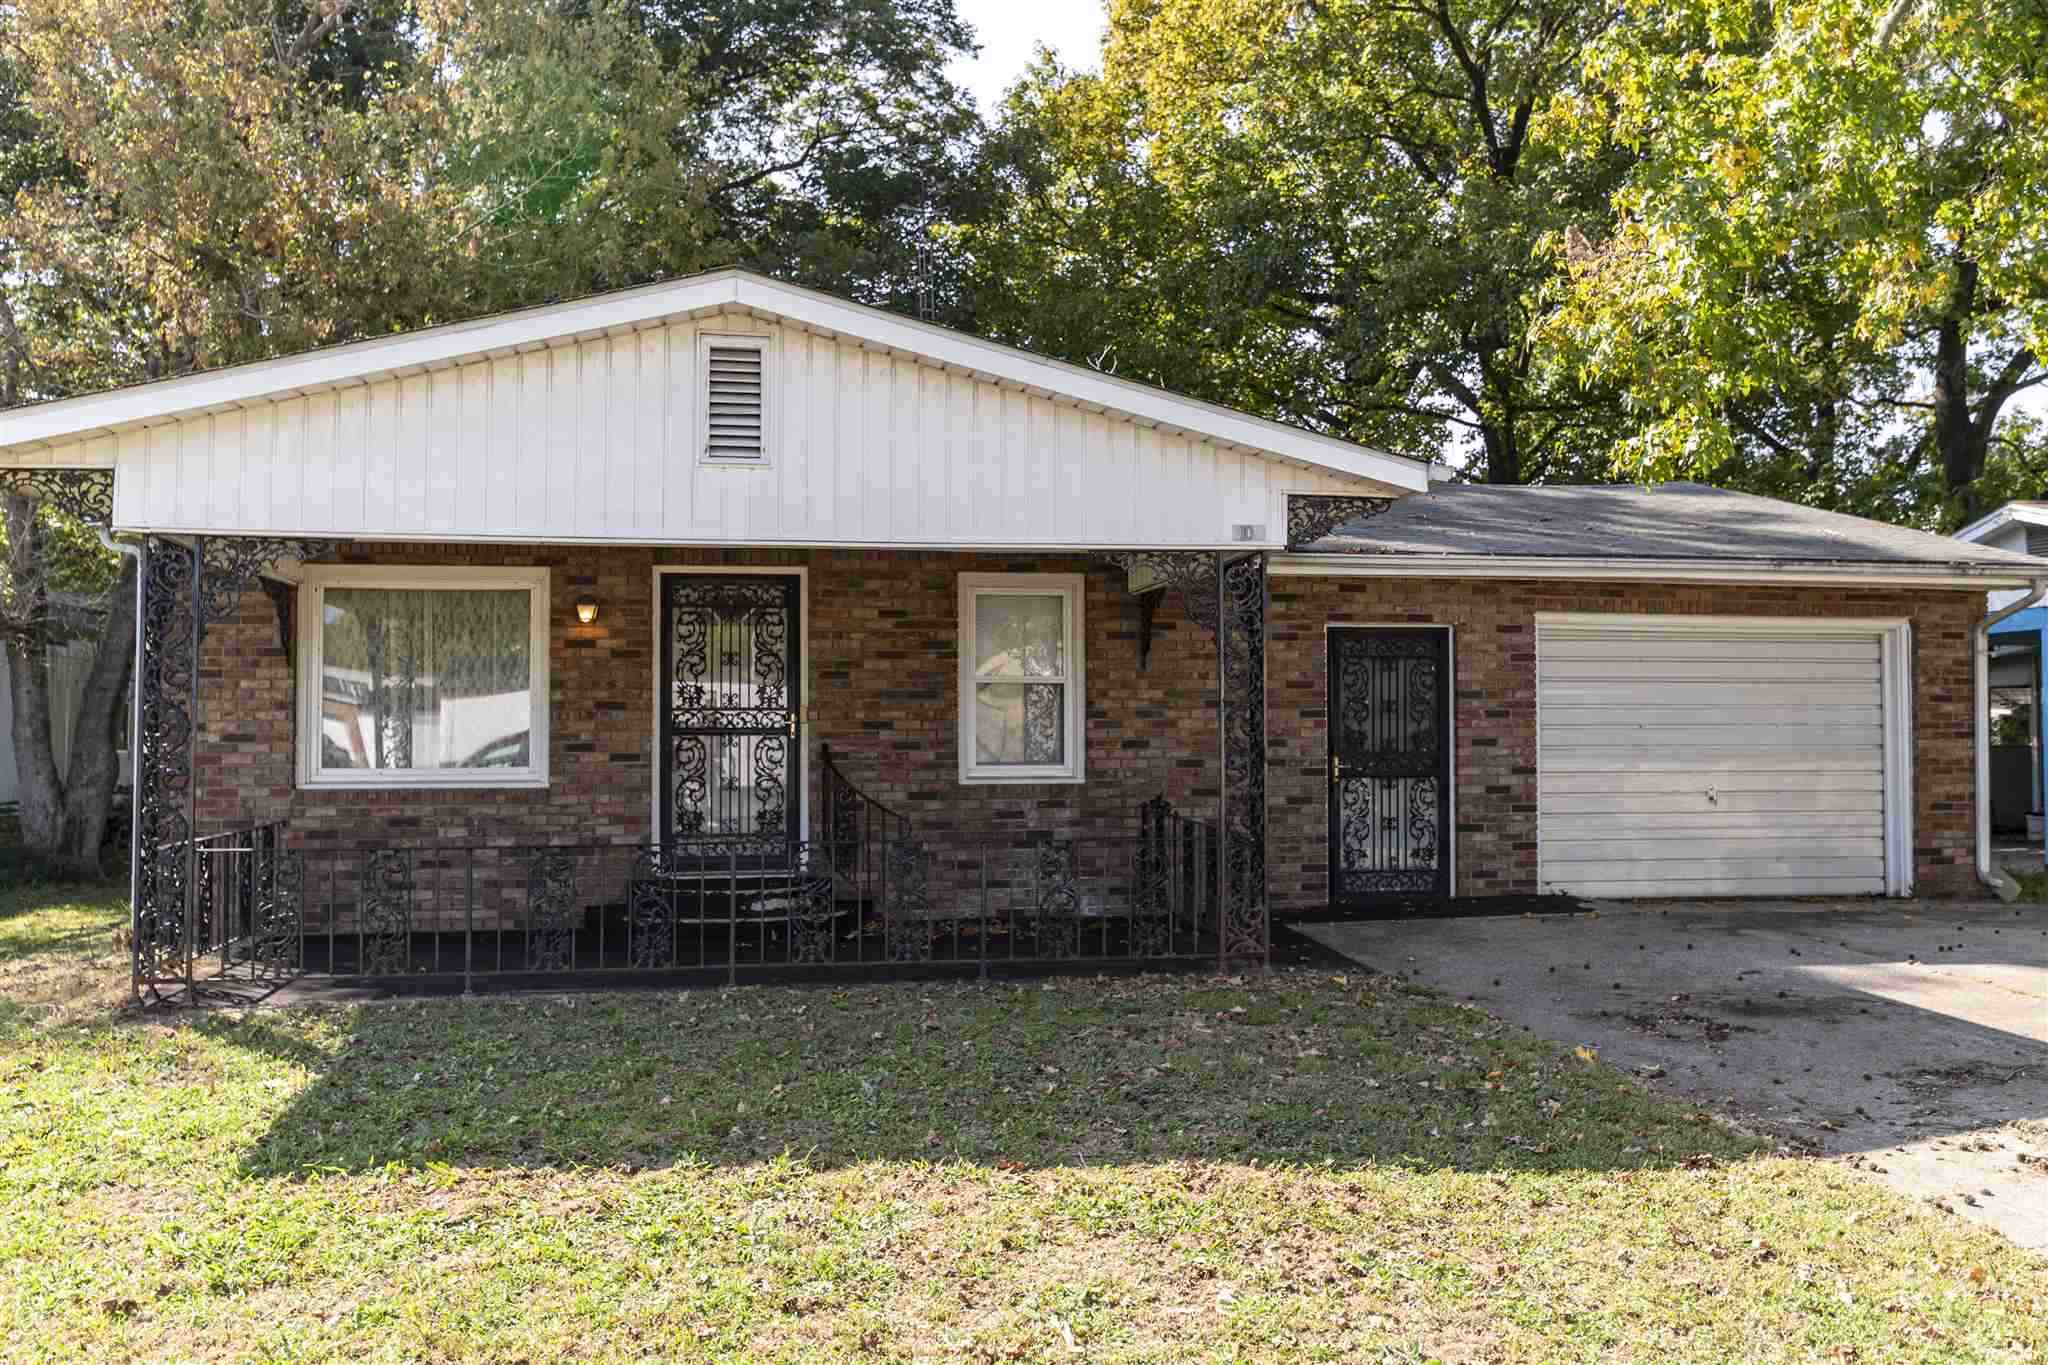 108 N WALNUT Property Photo - DeSoto, IL real estate listing